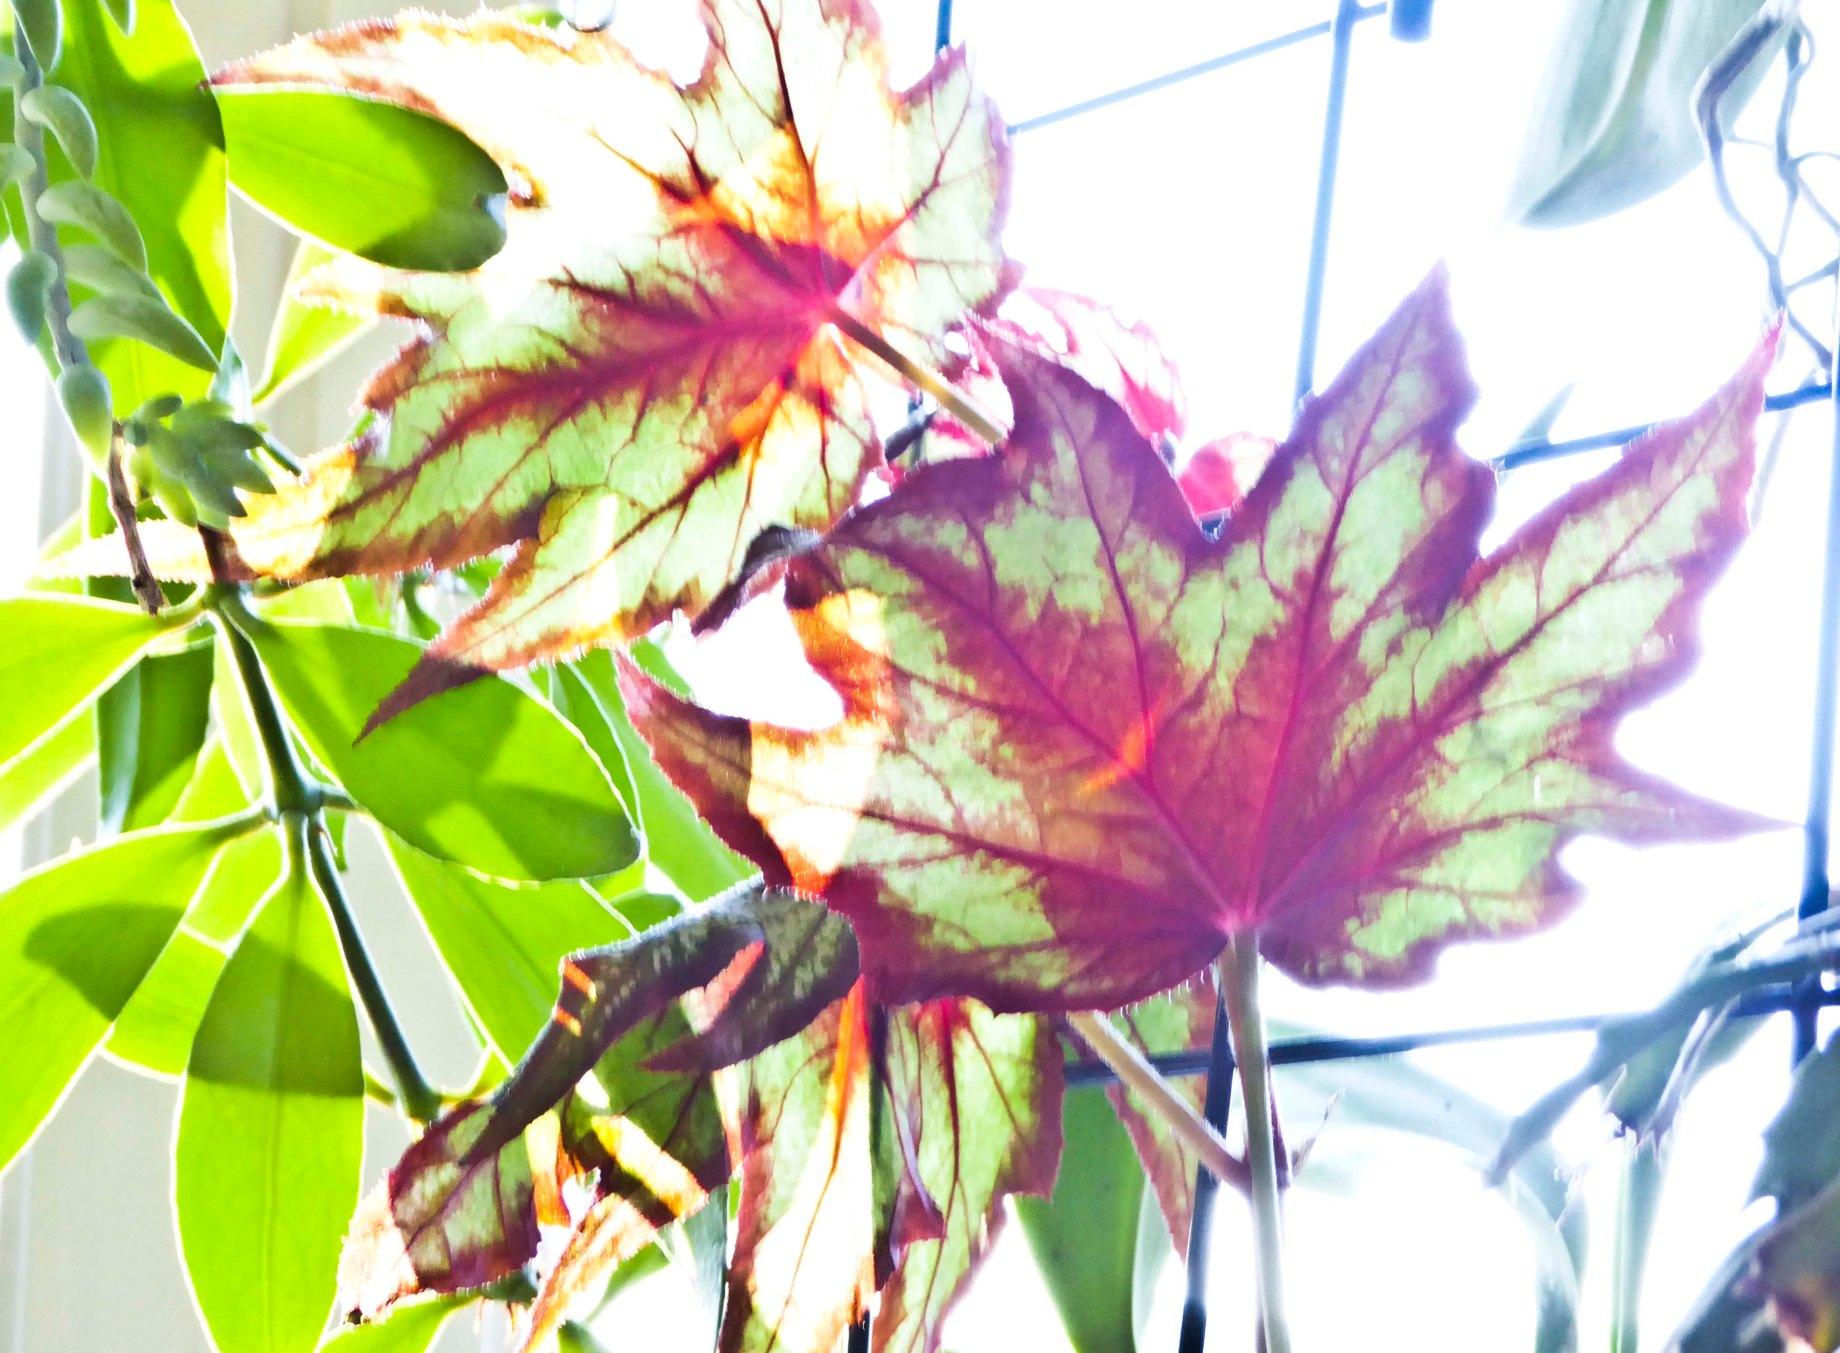 Blommor inomhus 039_copy